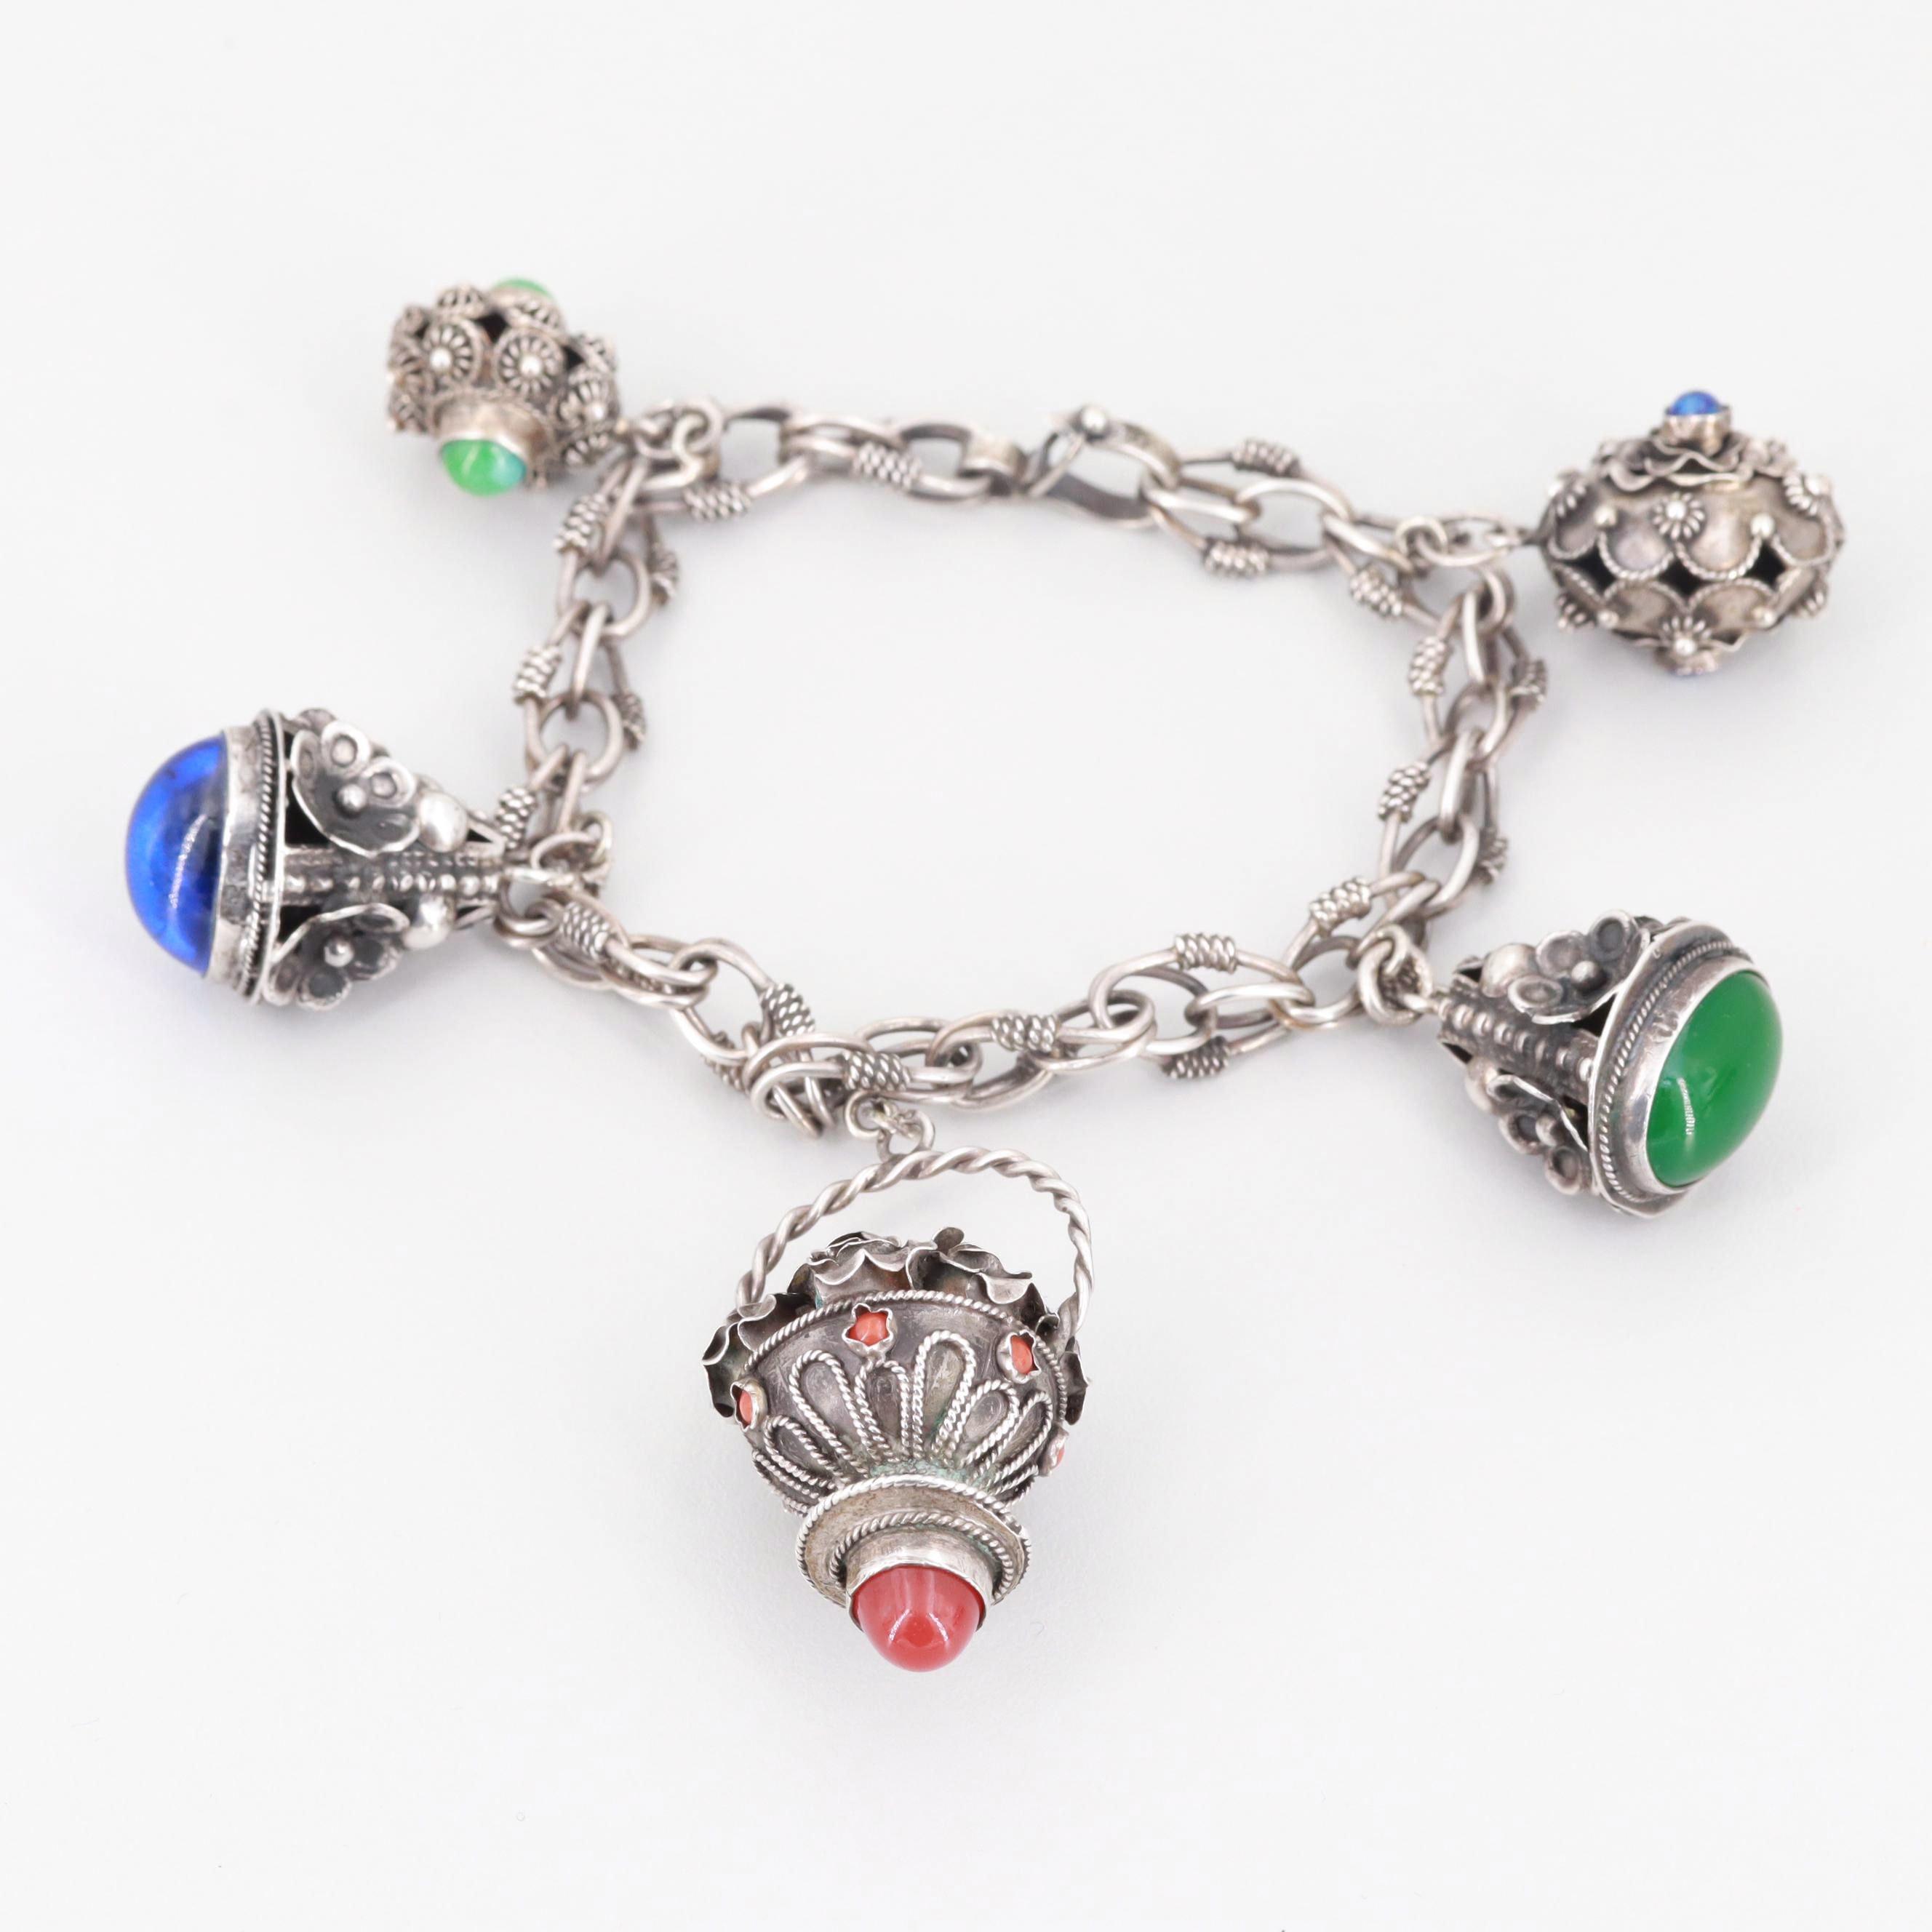 Etruscan Revival Style 800 Silver Glass Cannetille Charm Bracelet